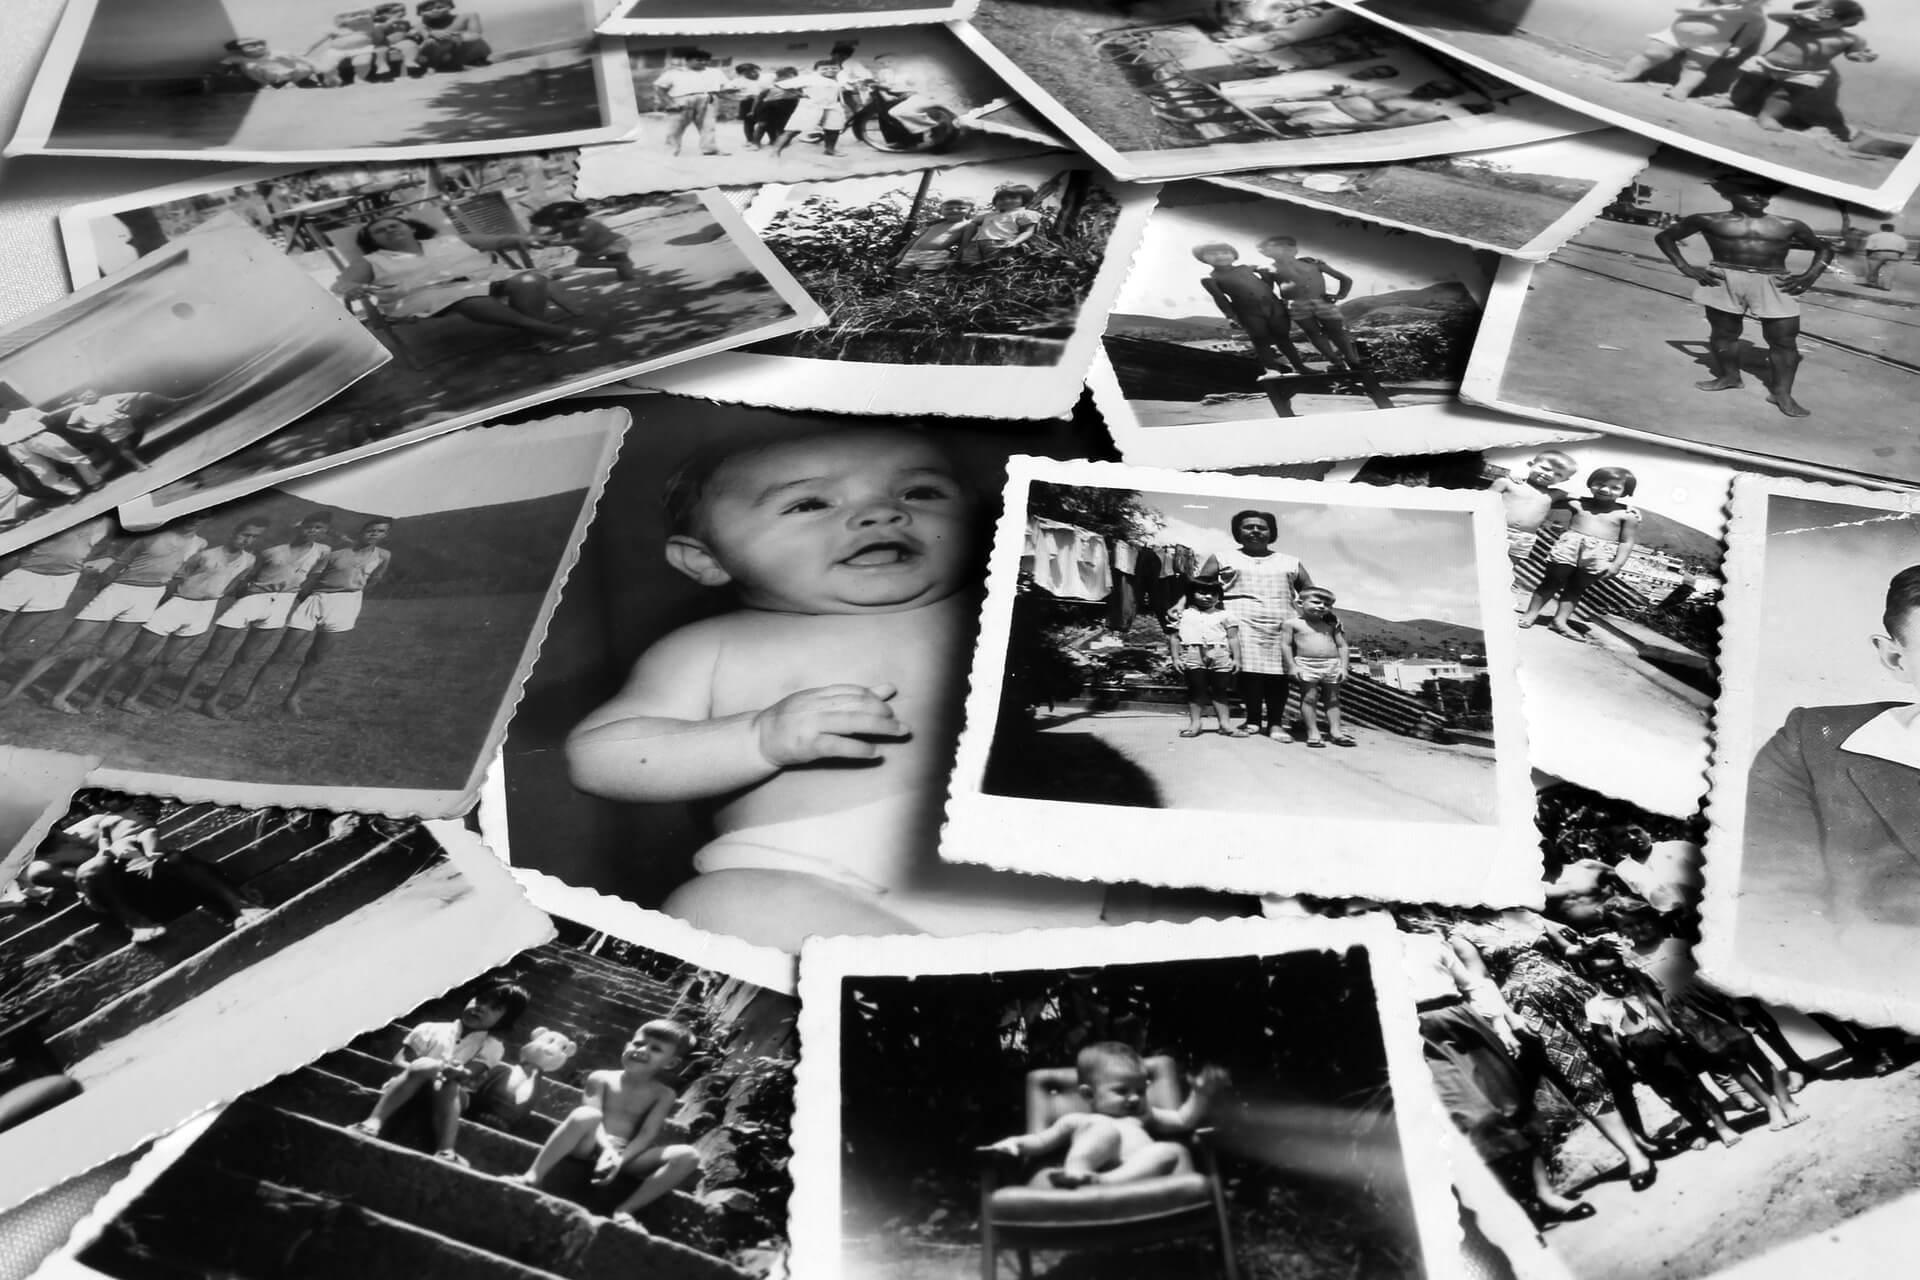 Черно-белые фотографии на столе